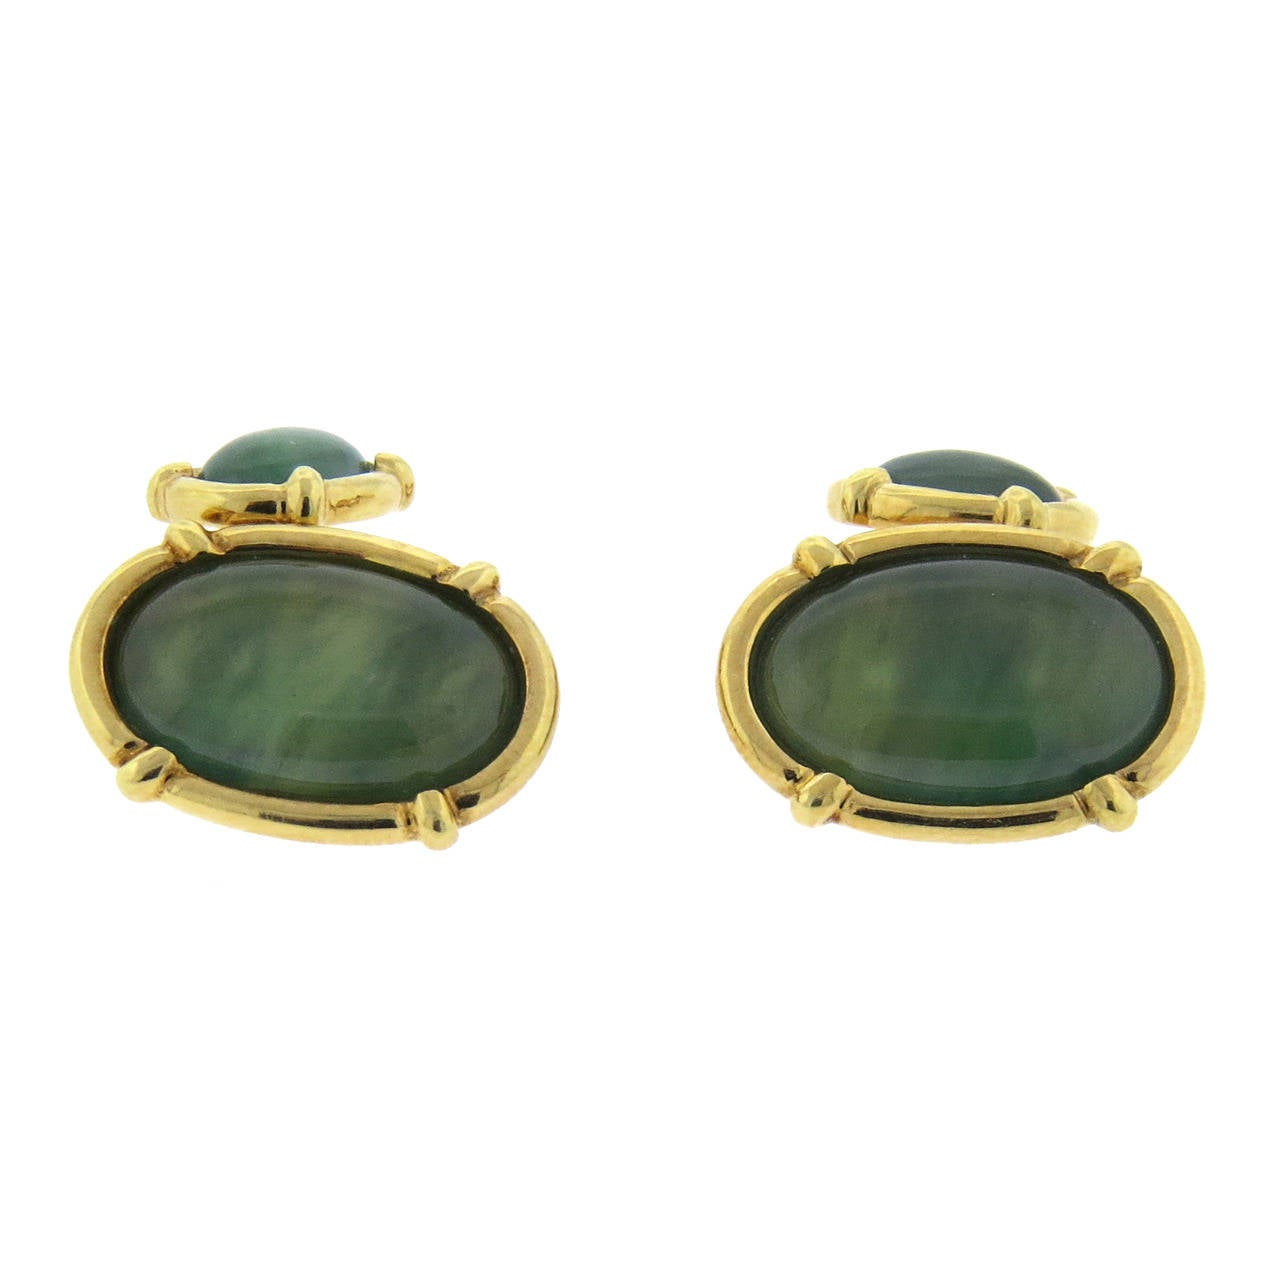 Oval Jade Gold Cufflinks